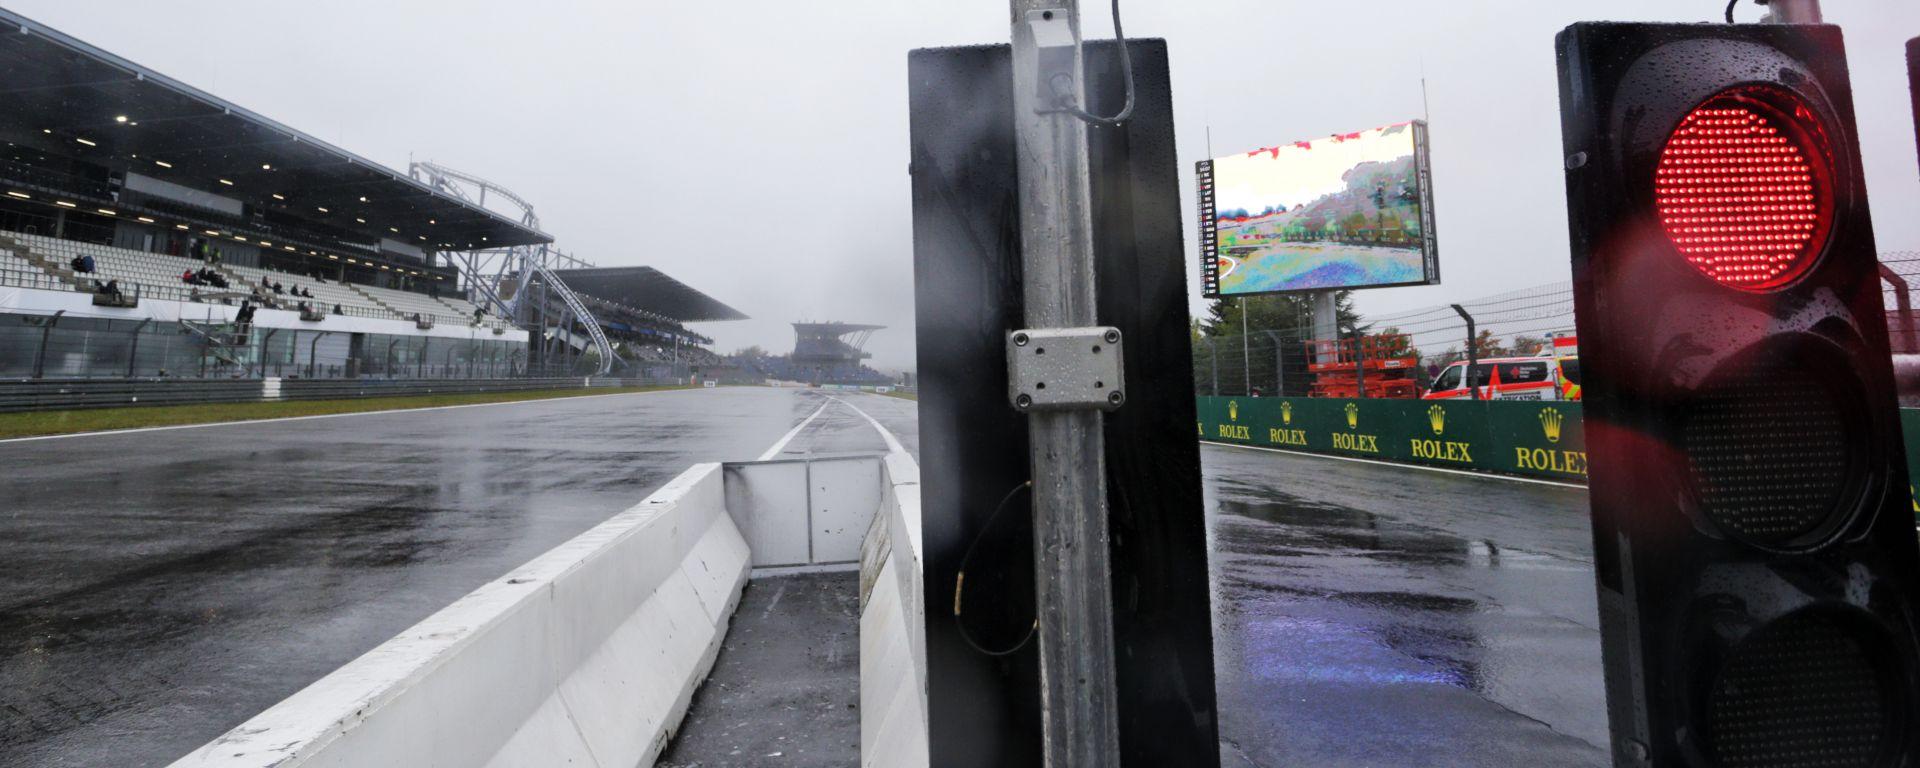 GP Eifel 2020, Nurburgring: il semaforo rosso in fondo alla pit-lane